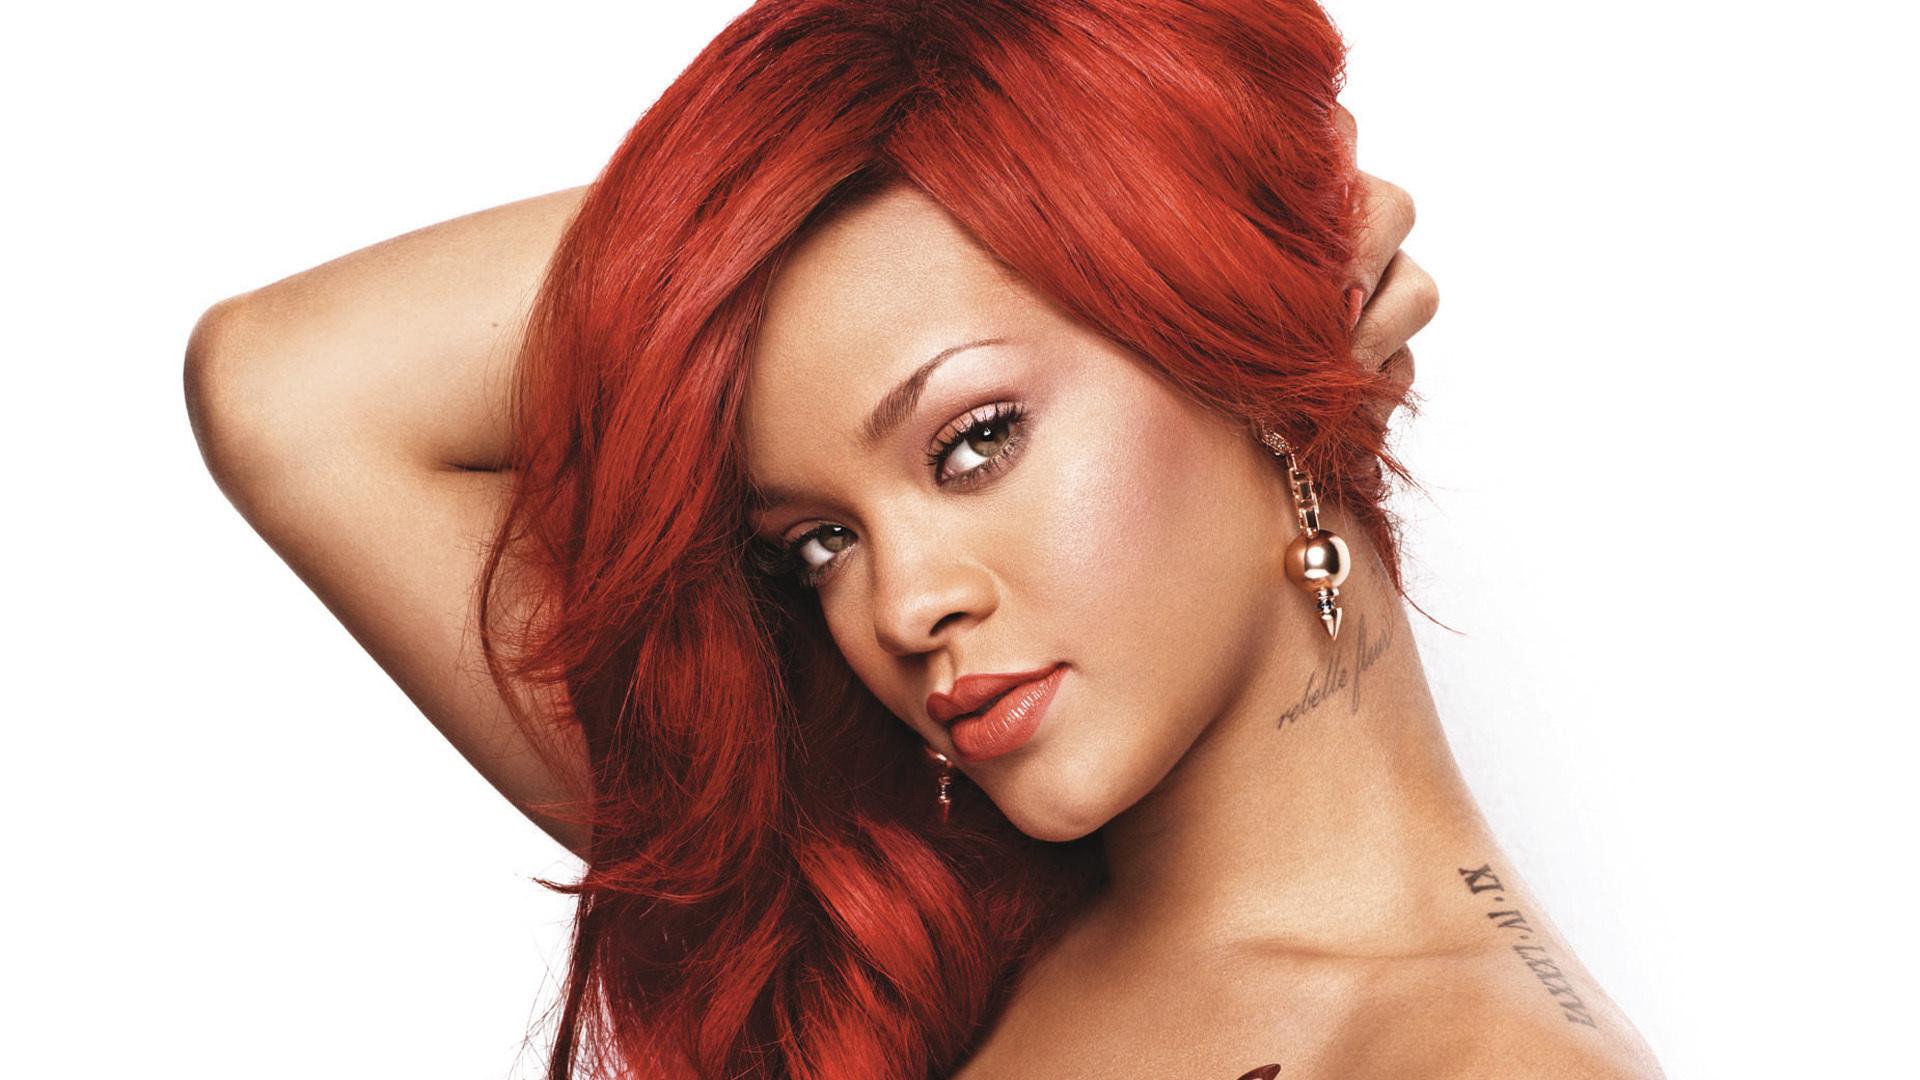 Rihanna HD Wallpapers   Wallpaper High Definition High Quality 1920x1080